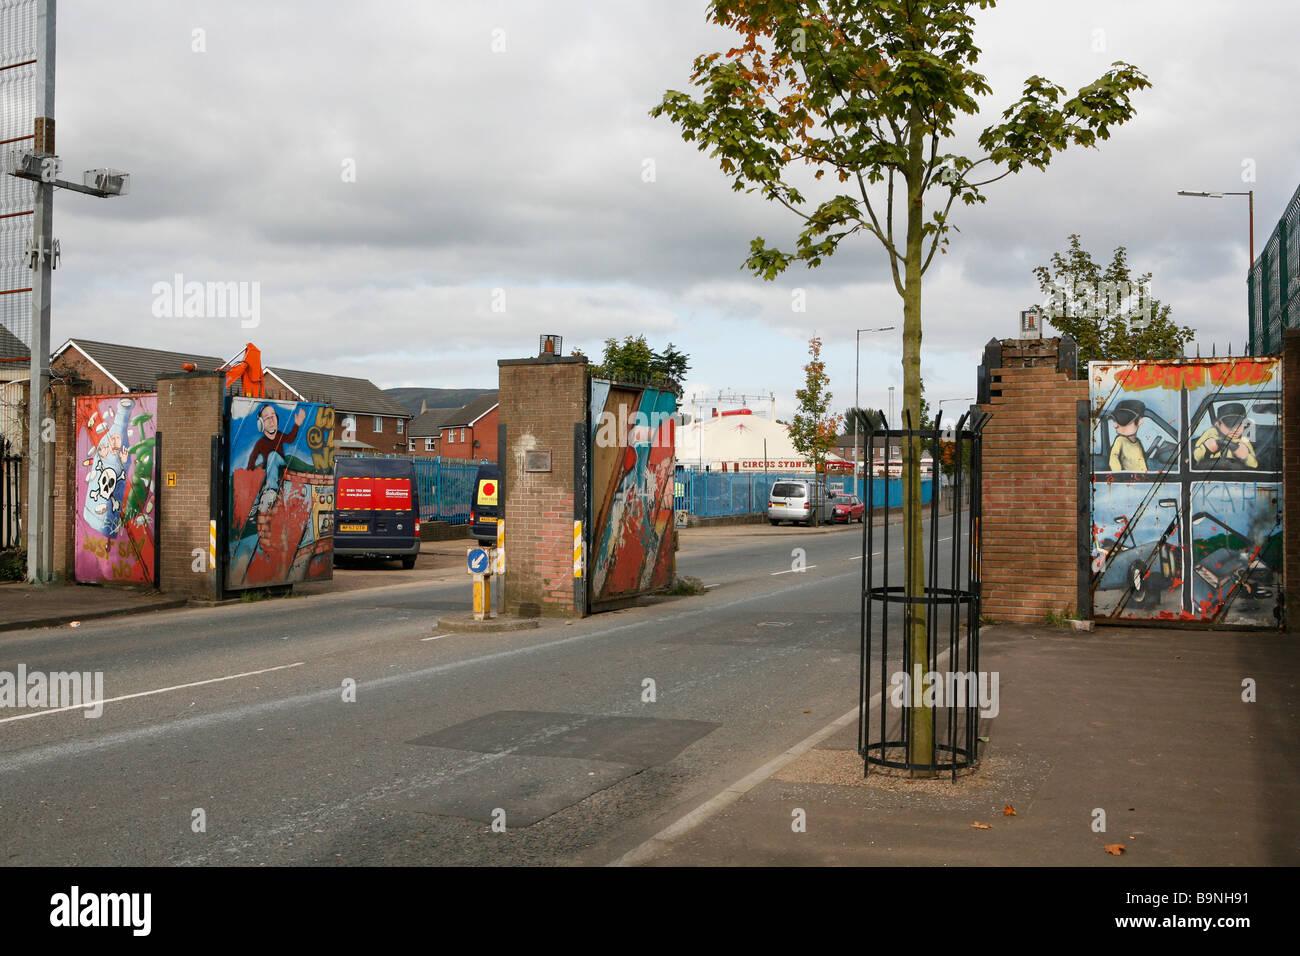 Gates in a peace line, Lanark Way, West Belfast. - Stock Image